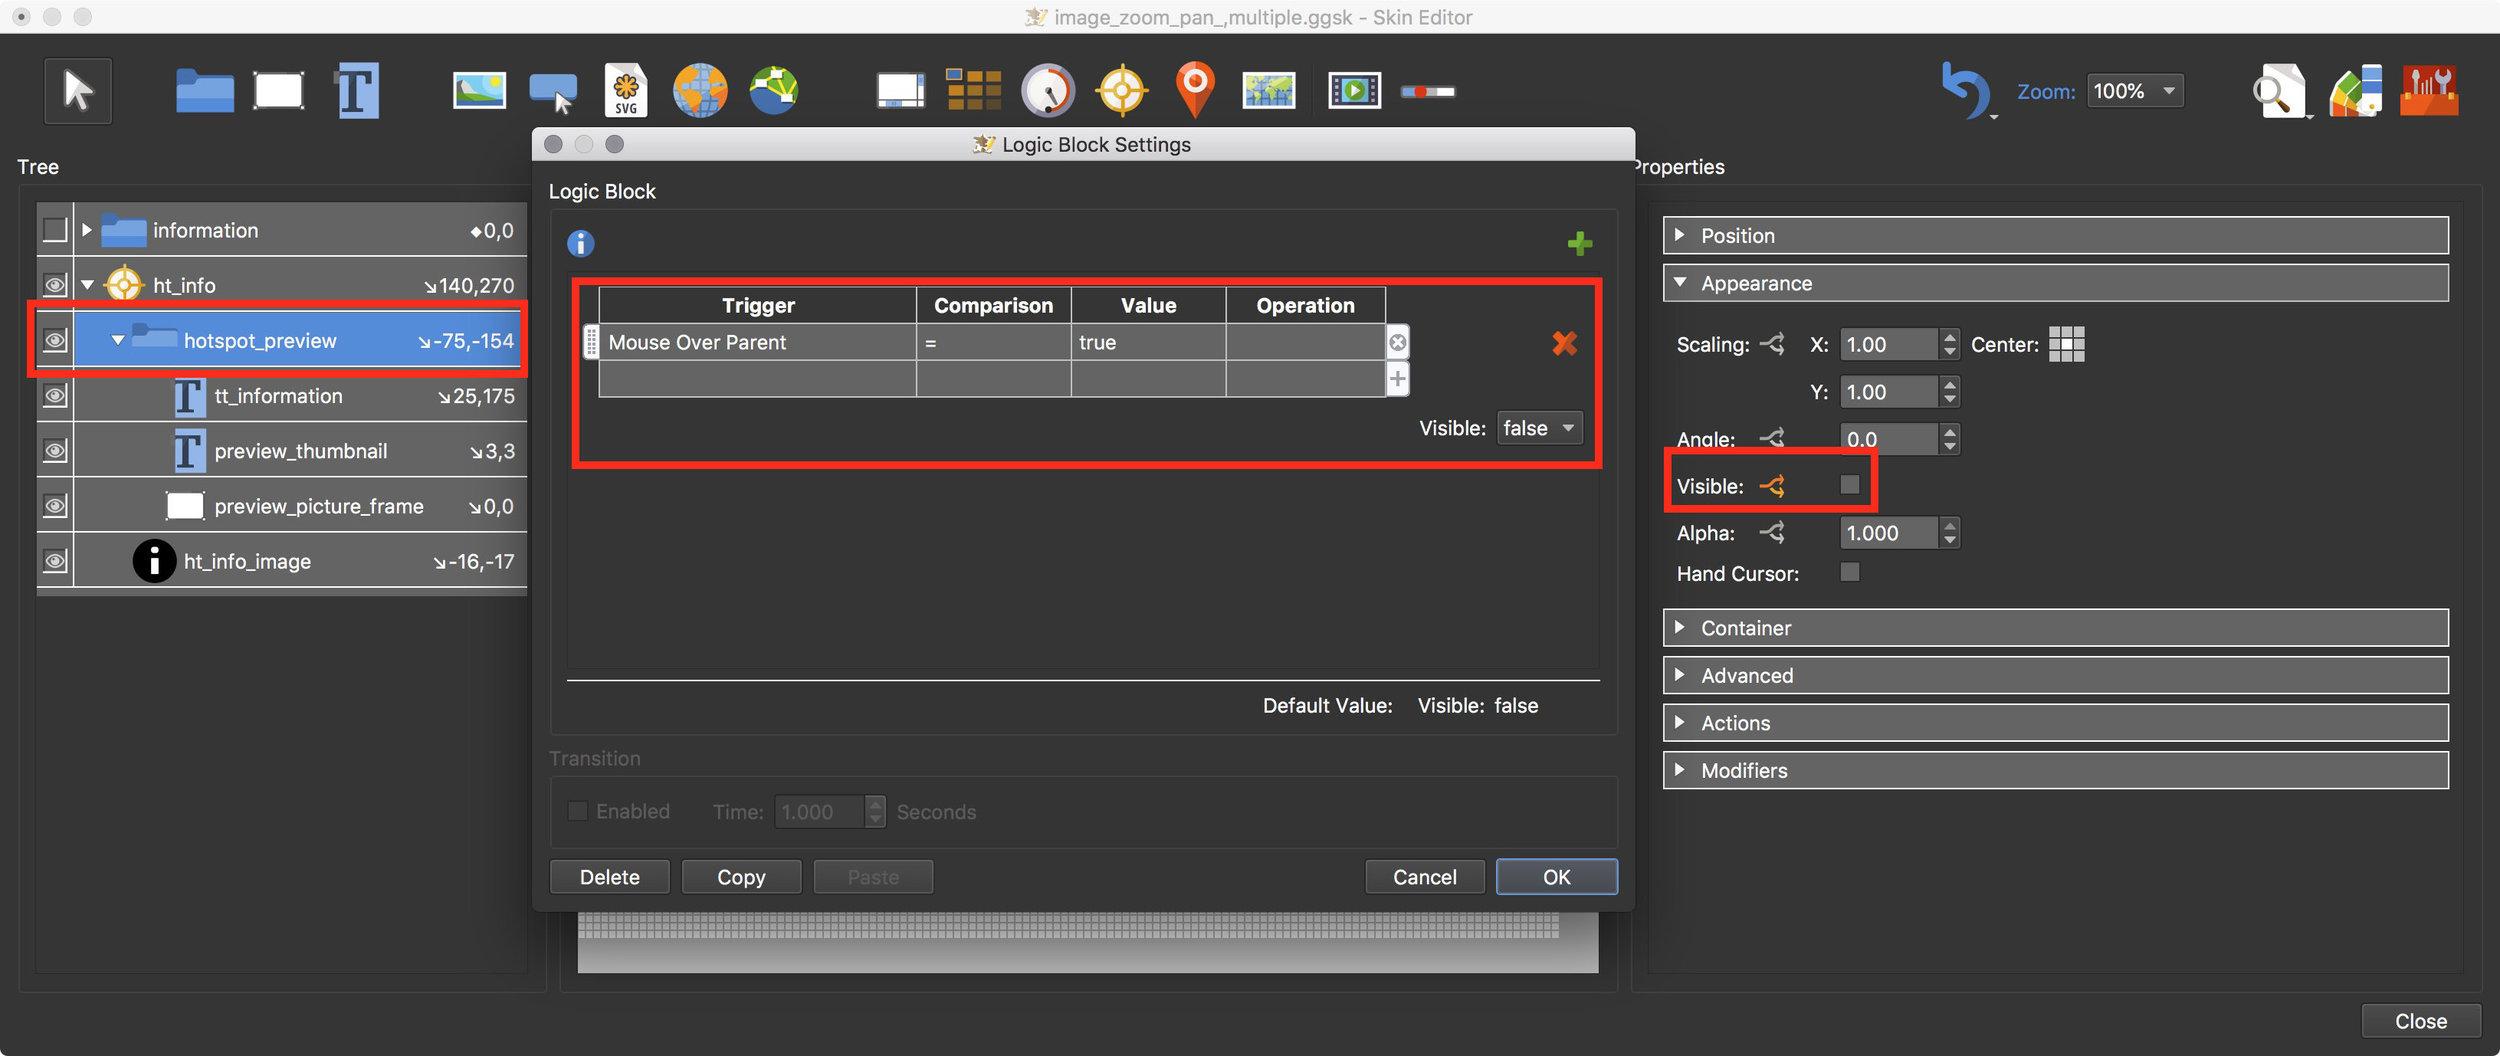 Figure #29: hotspot_preview settings & logic block